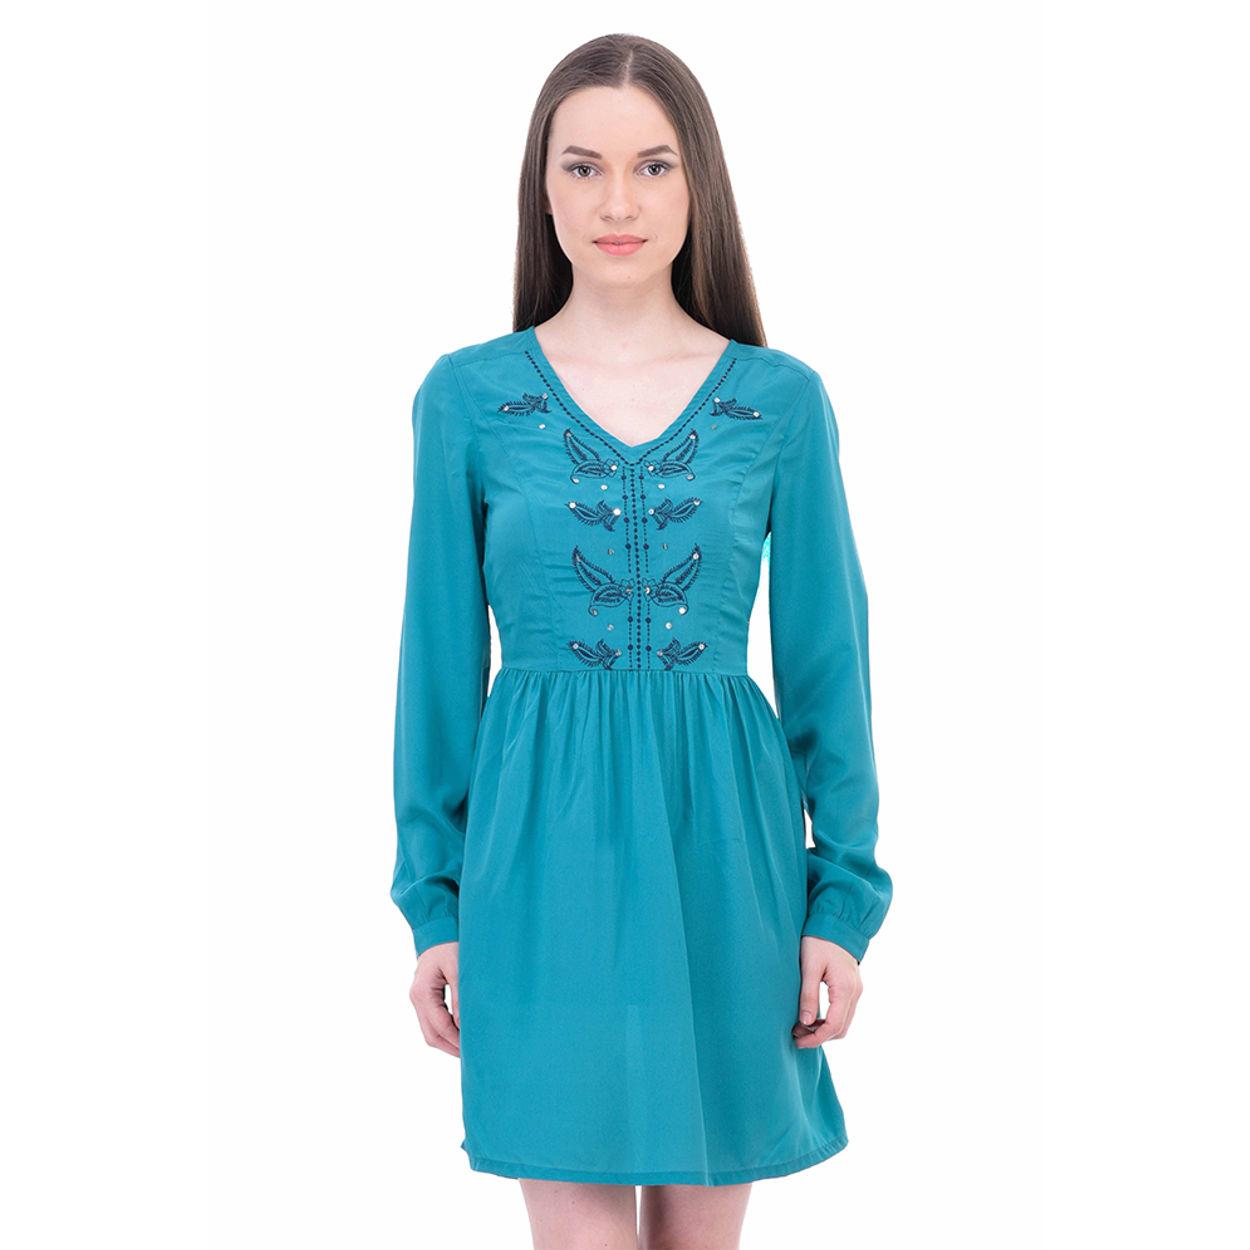 Women Sequin Party Dress | W16026wem003